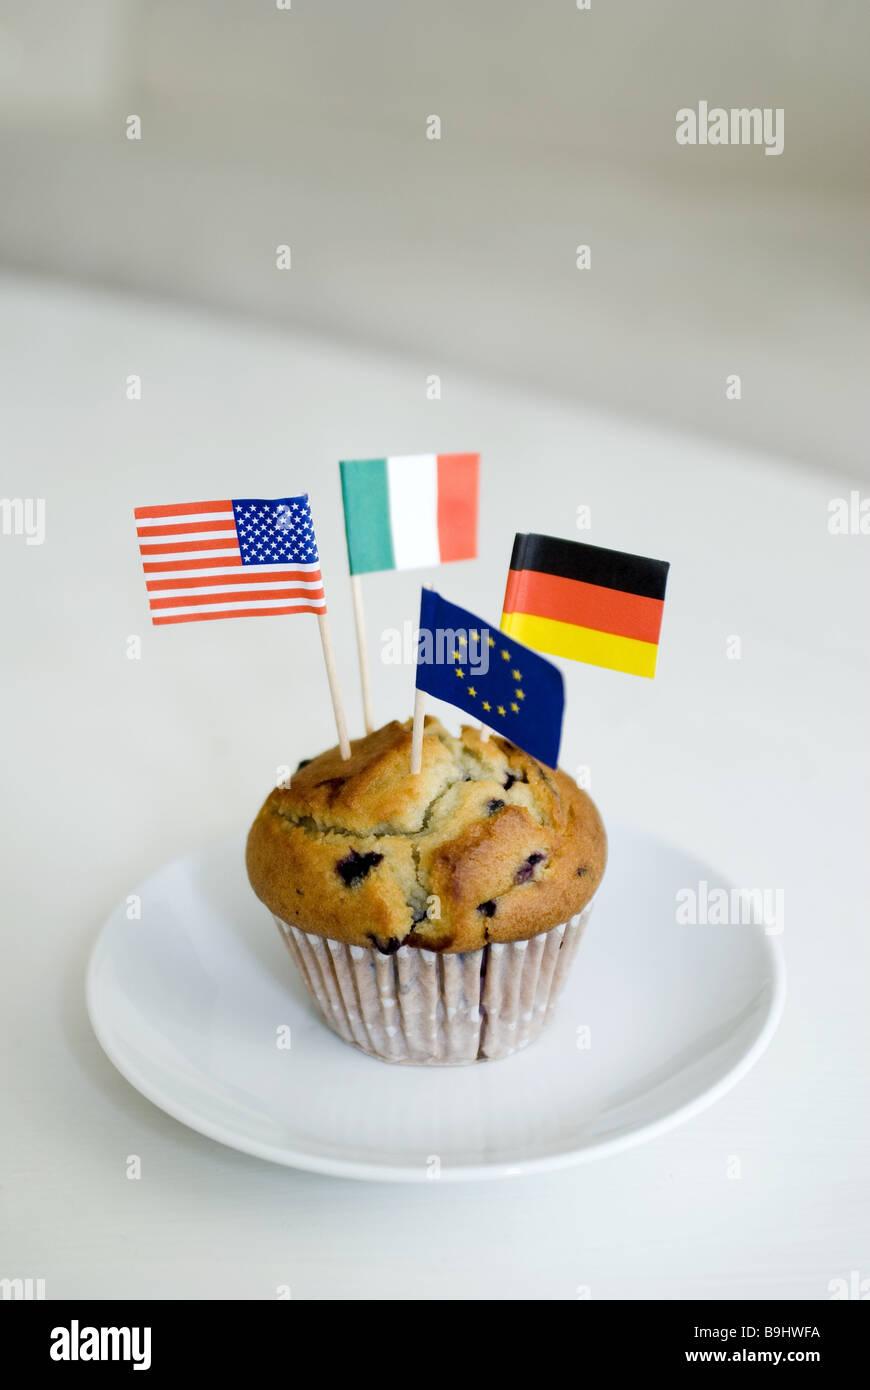 Muffin Platten Deutschland Flaggen Italien Fahnen Amerika Flaggen